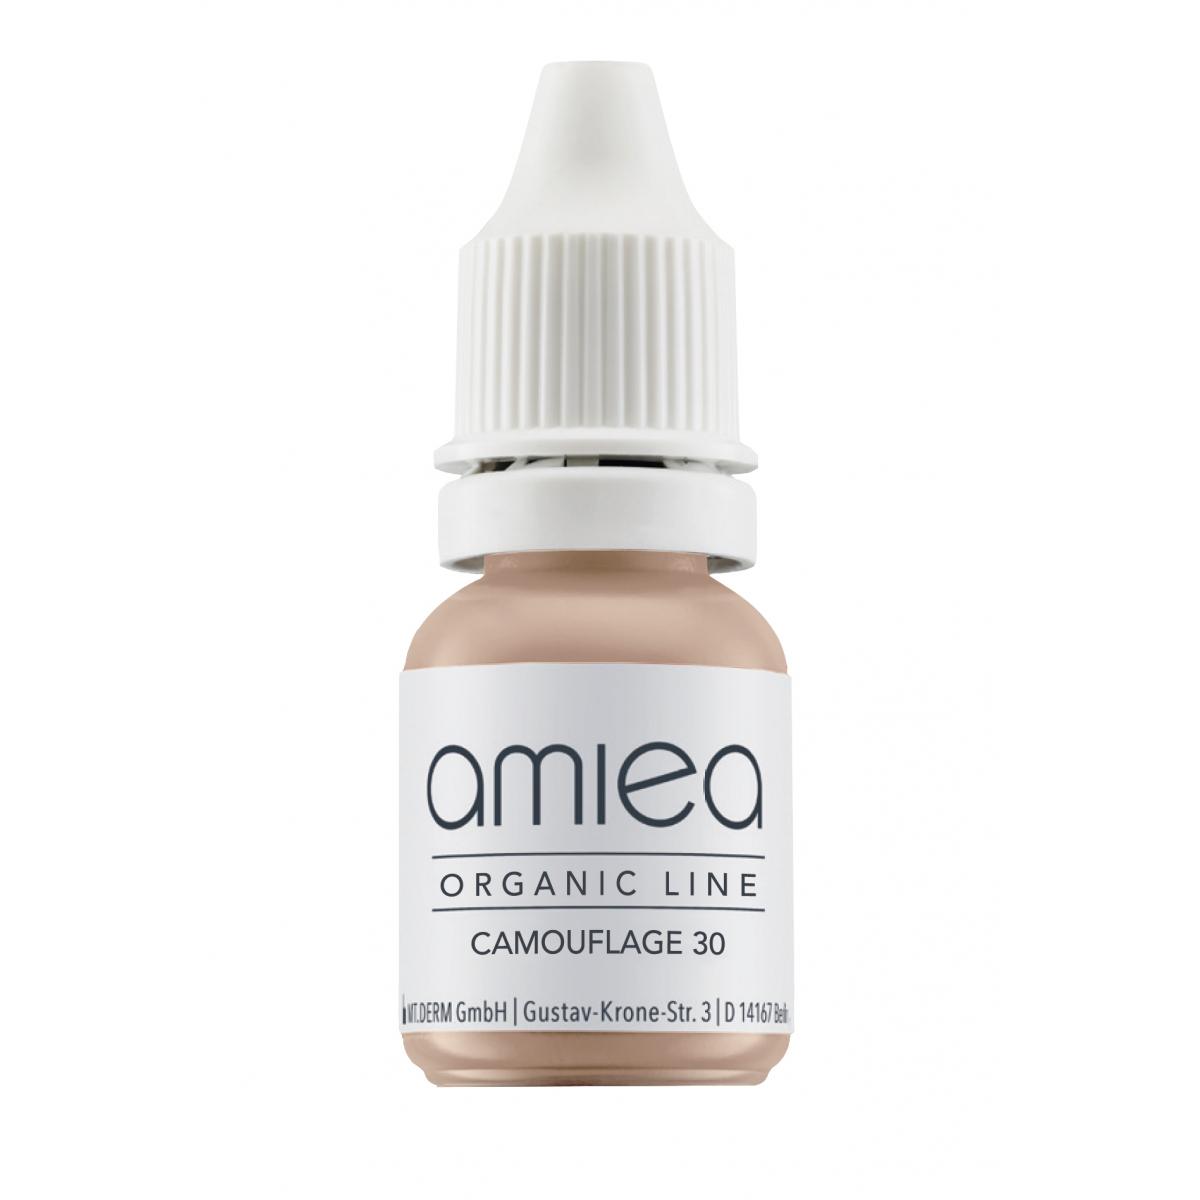 ORGANIC LINE (5ml)  - PIGMENT CAMOUFLAGE 30 ORGANICLINE AMIEA (5 ml)